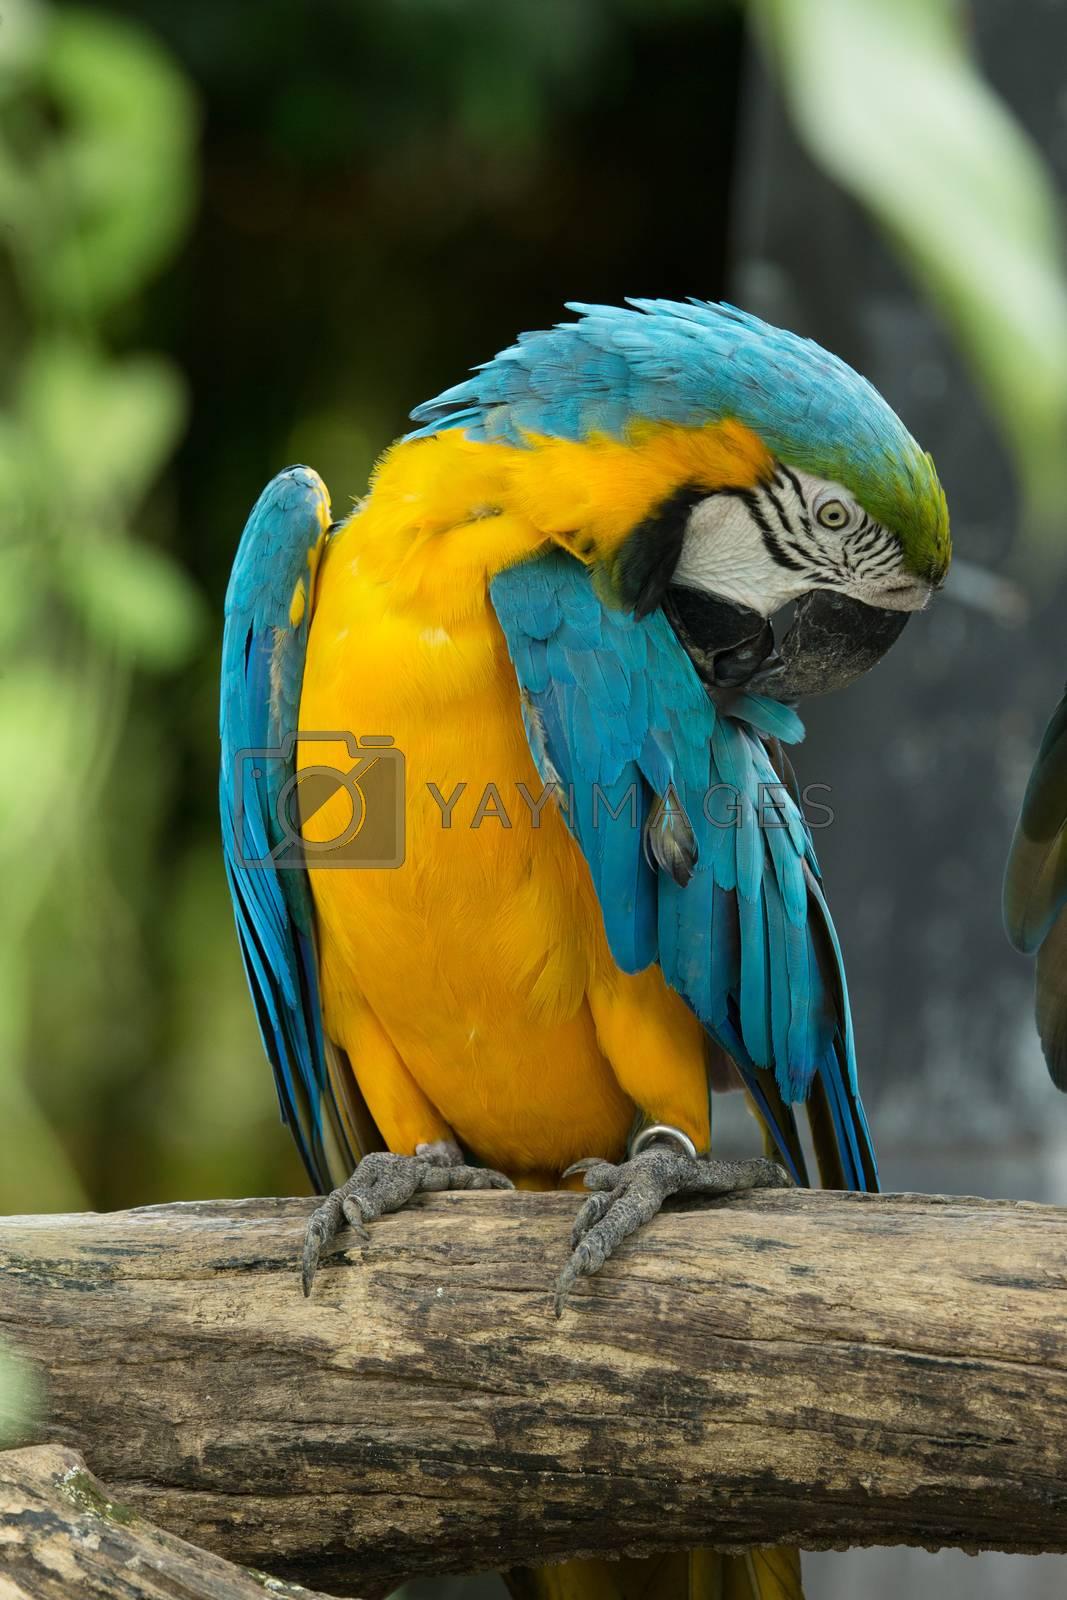 macaw bird sitting on the tree